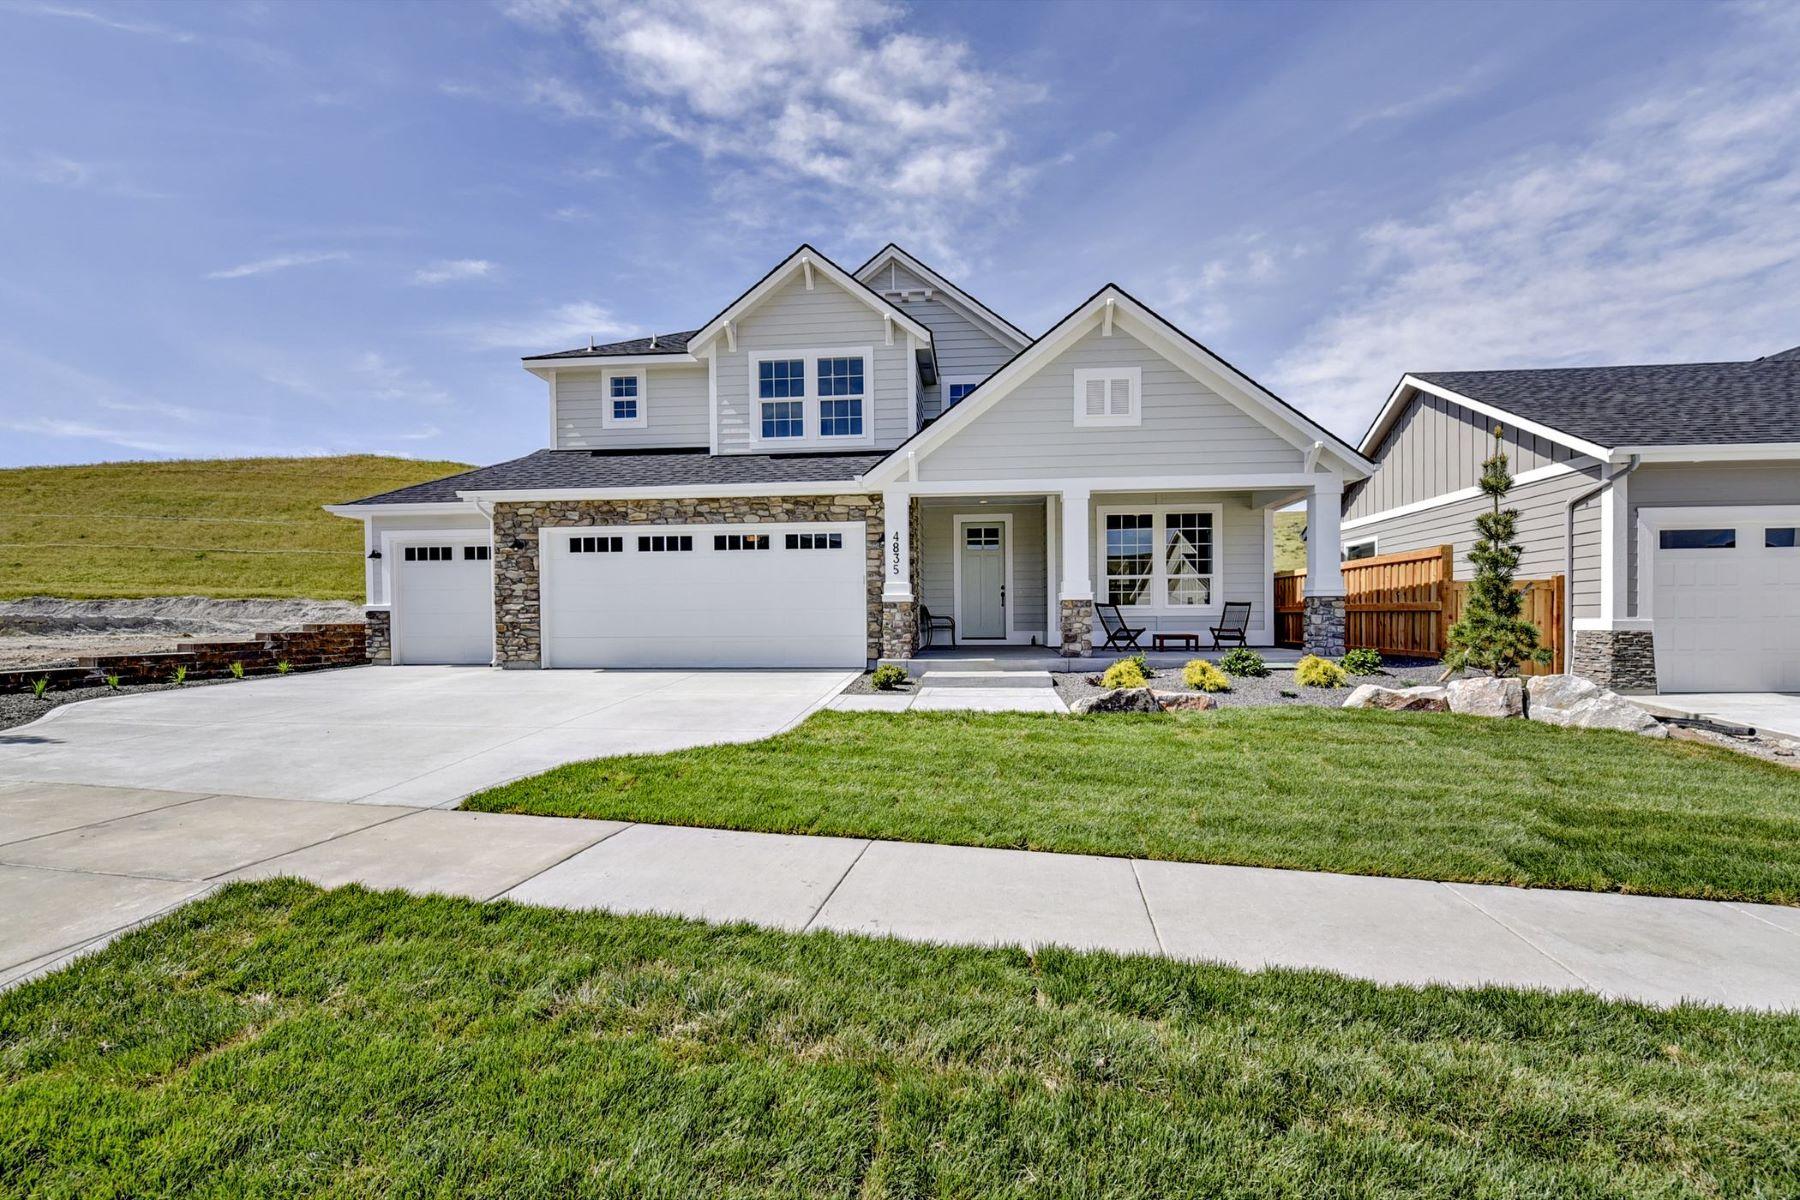 獨棟家庭住宅 為 出售 在 4835 Barnview Dr, Boise 4835 W Barnview Dr, Boise, 愛達荷州, 83714 美國